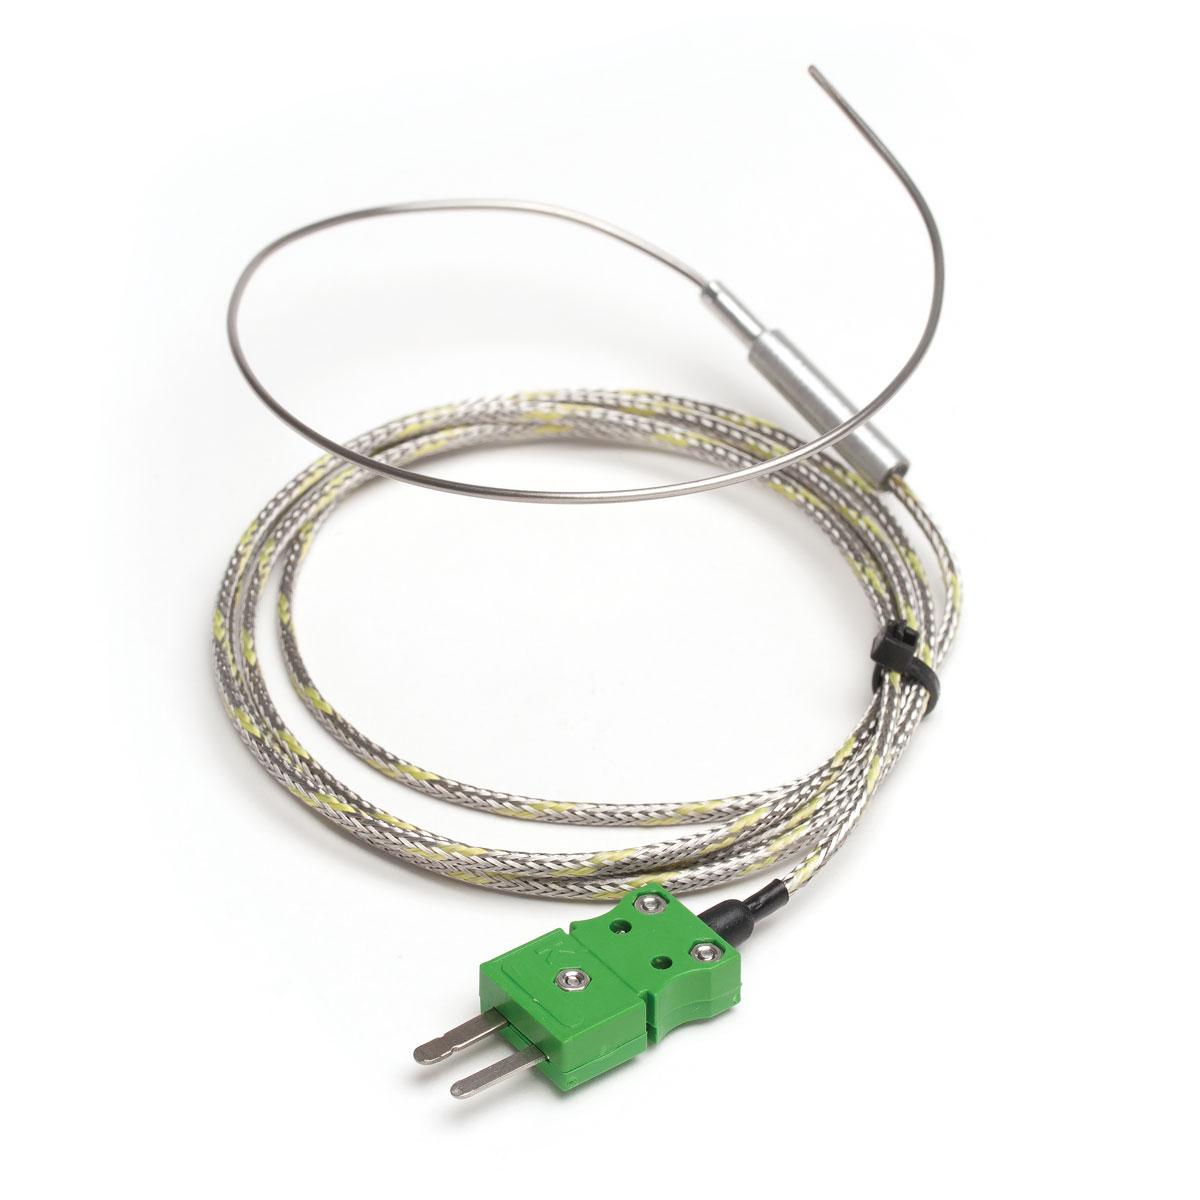 Sonda Termopar Tipo K Flexible para Altas Temperaturas - HI766F